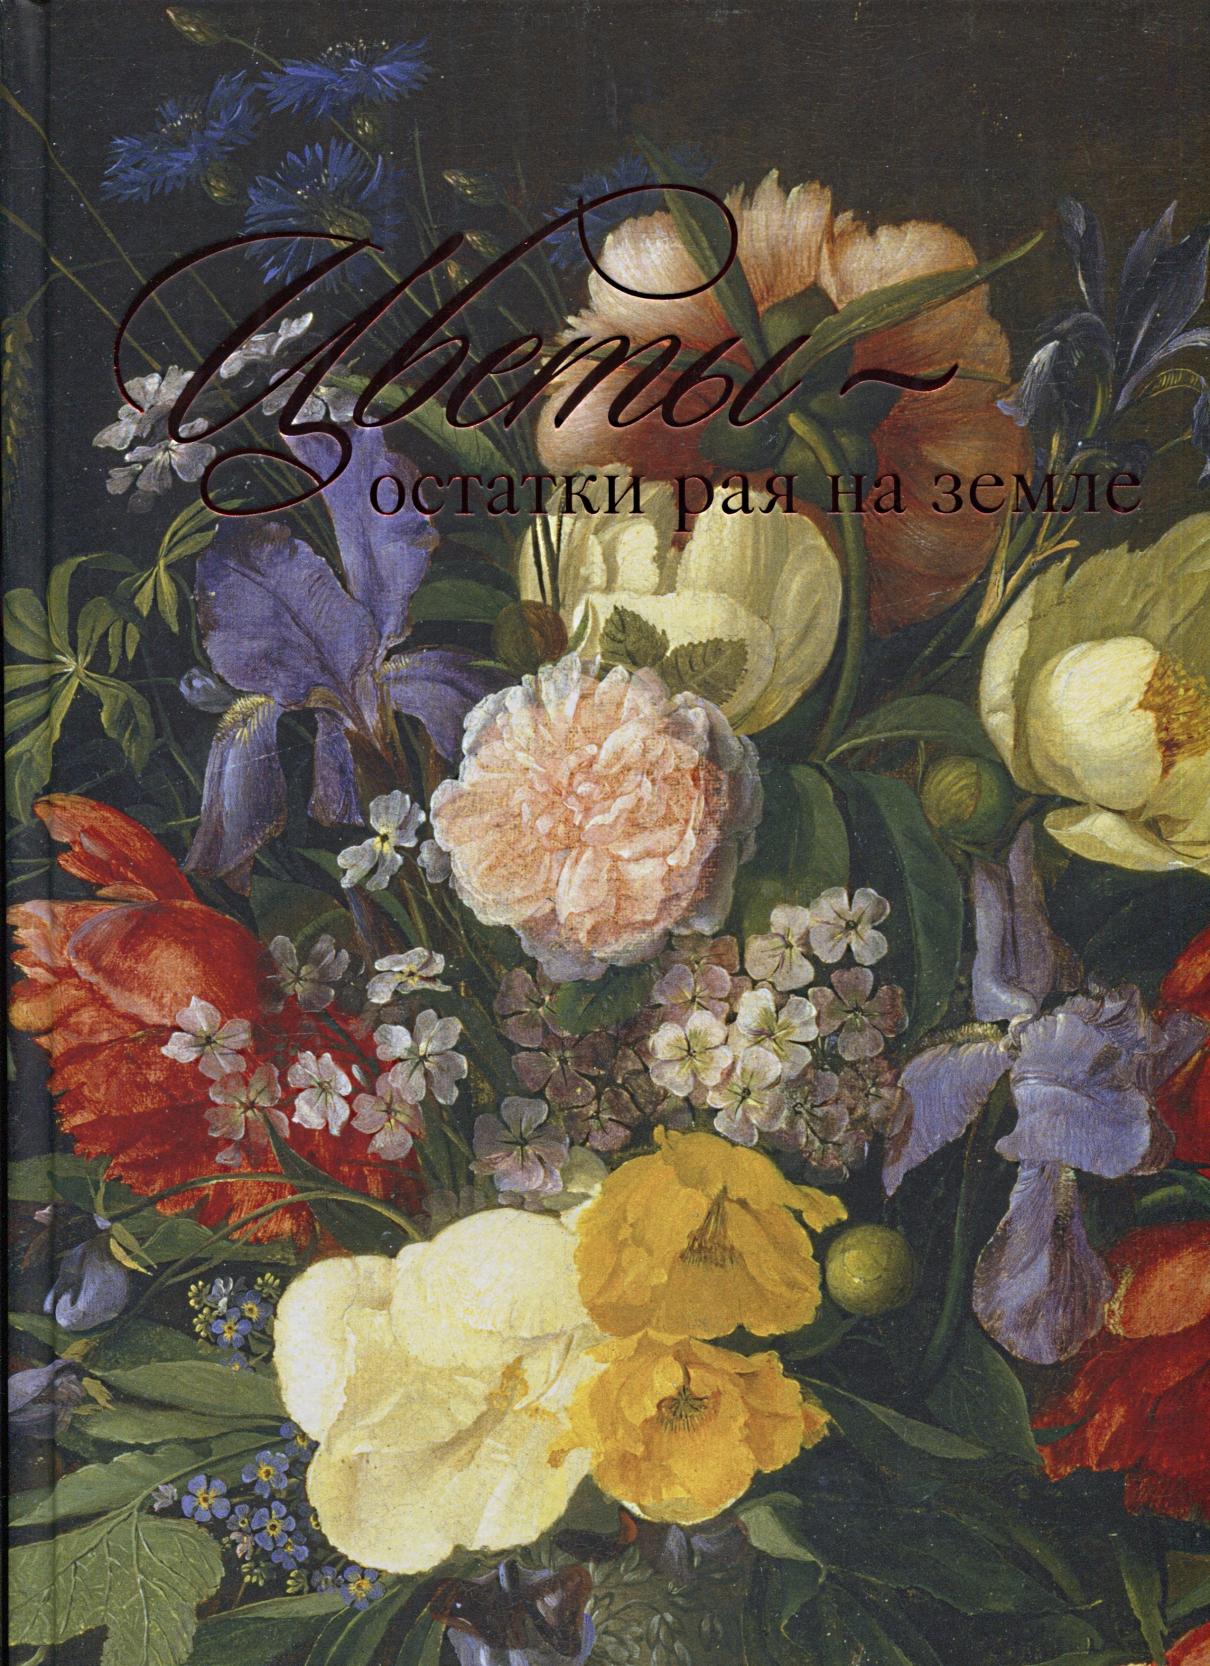 Цветы-остатки рая на земле +с/о